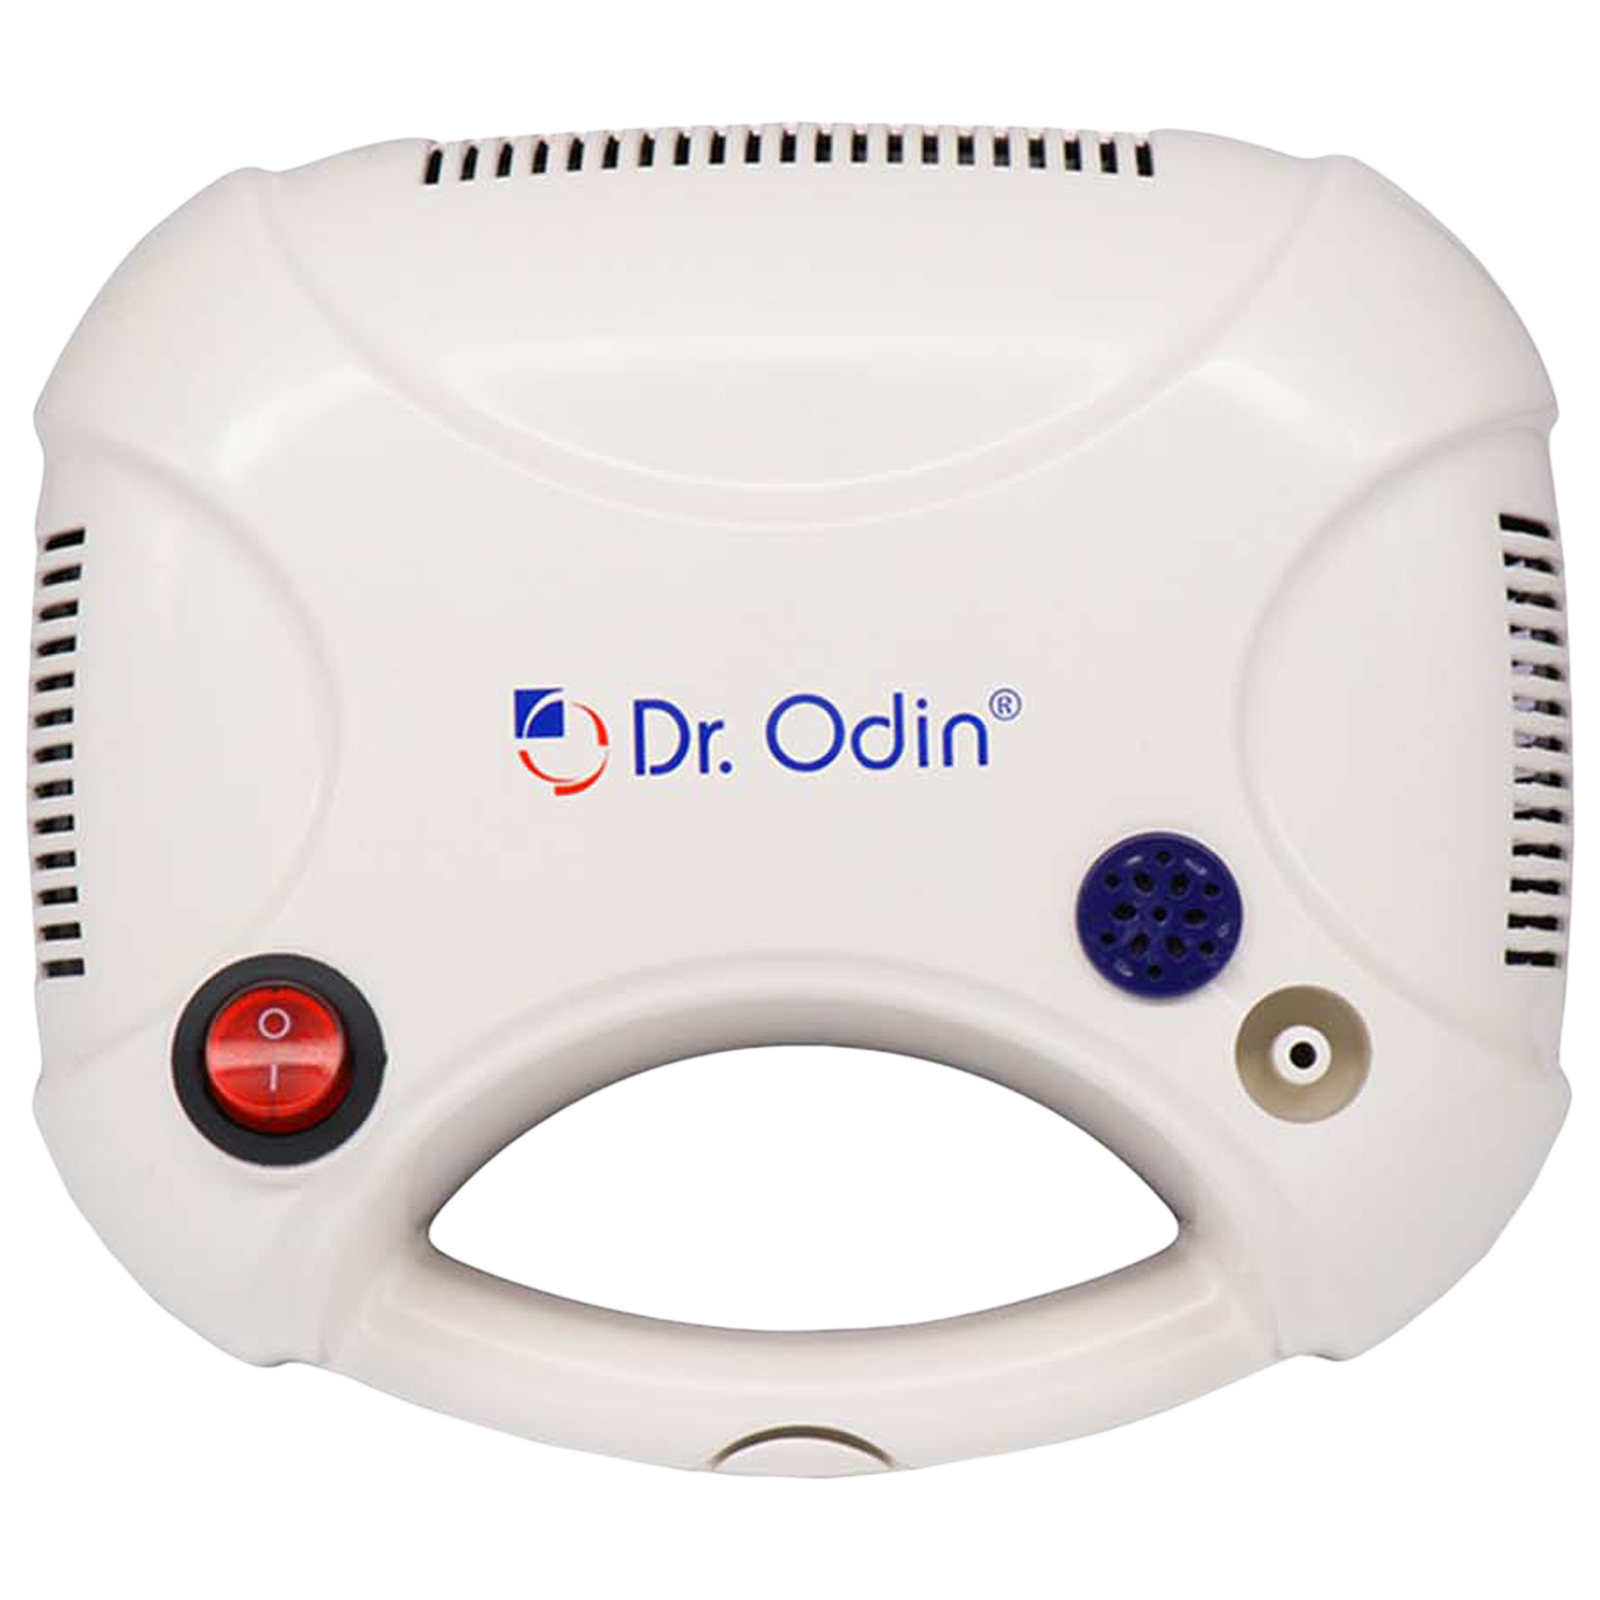 Dr. Odin Nebuliser (Steady Working Air Flow, OD-303, White)_1